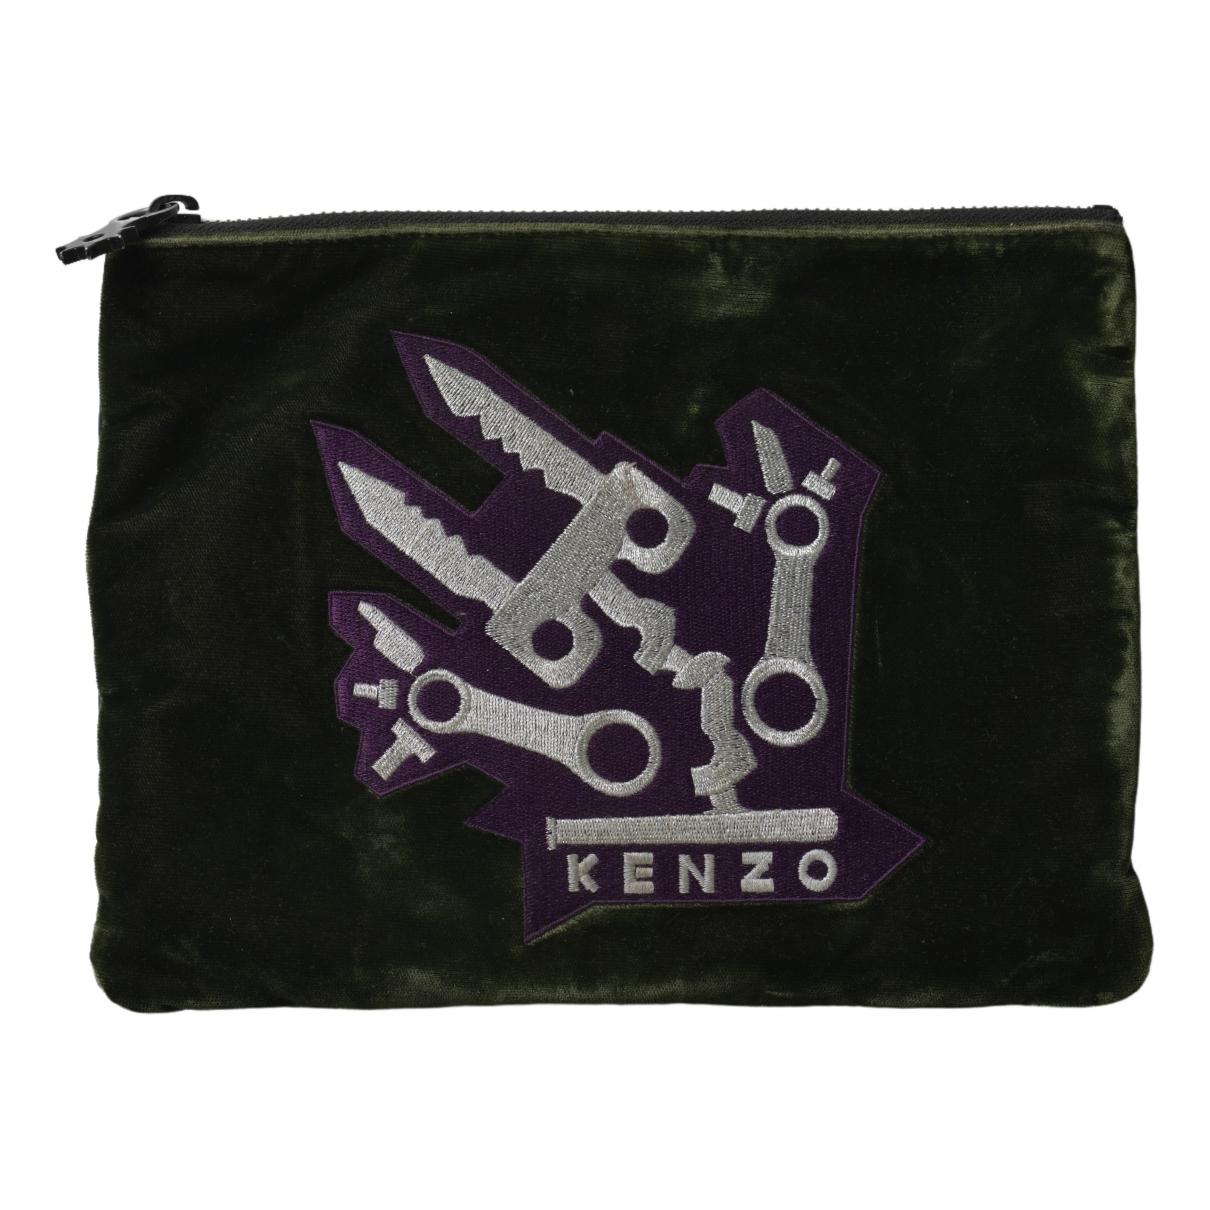 Kenzo - Petite maroquinerie   pour femme en toile - kaki